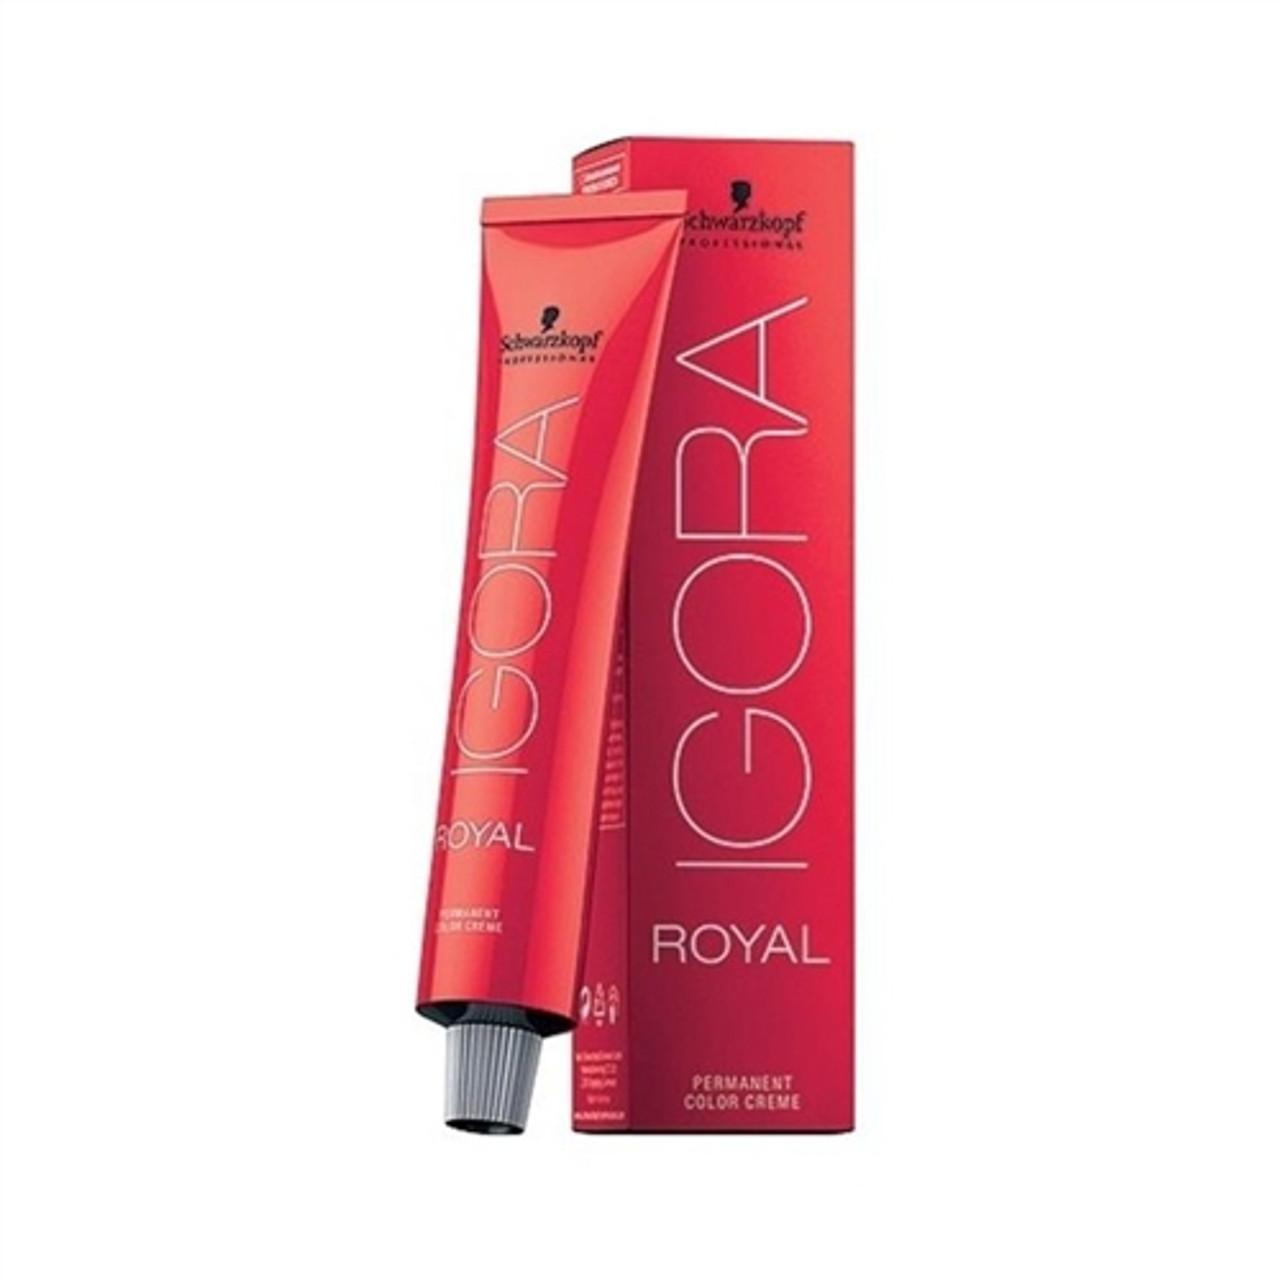 12-4 Beige blondee Igora Royal Permanent Color Creme -